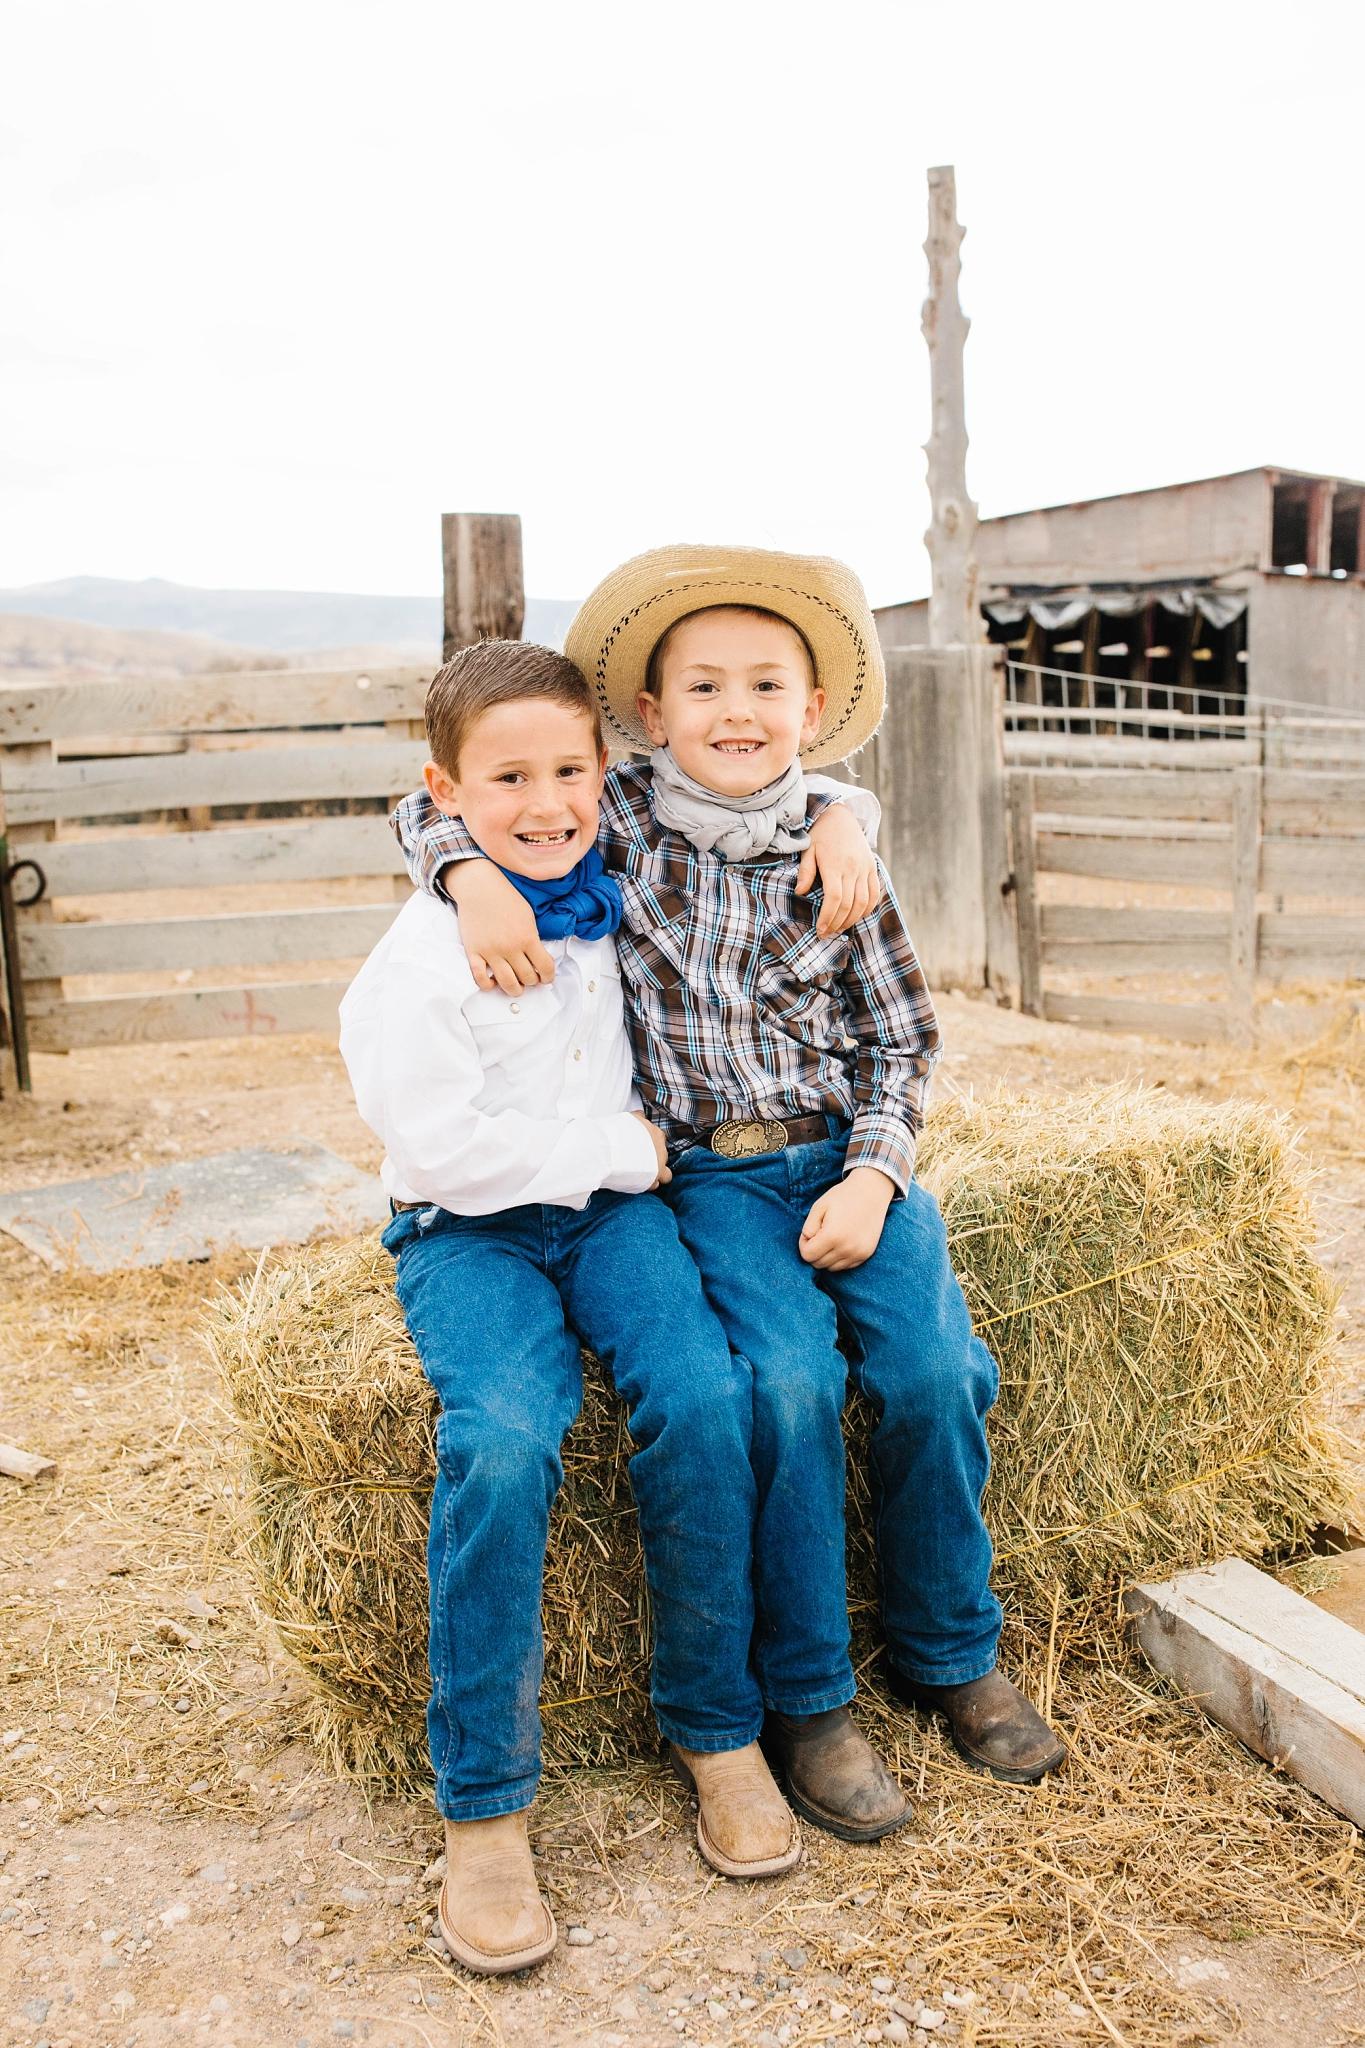 Lister-97_Lizzie-B-Imagery-Utah-Family-Photographer-Lifestyle-Photography-Salt-Lake-City-Park-City-Utah-County-Farm-Family-Session.jpg